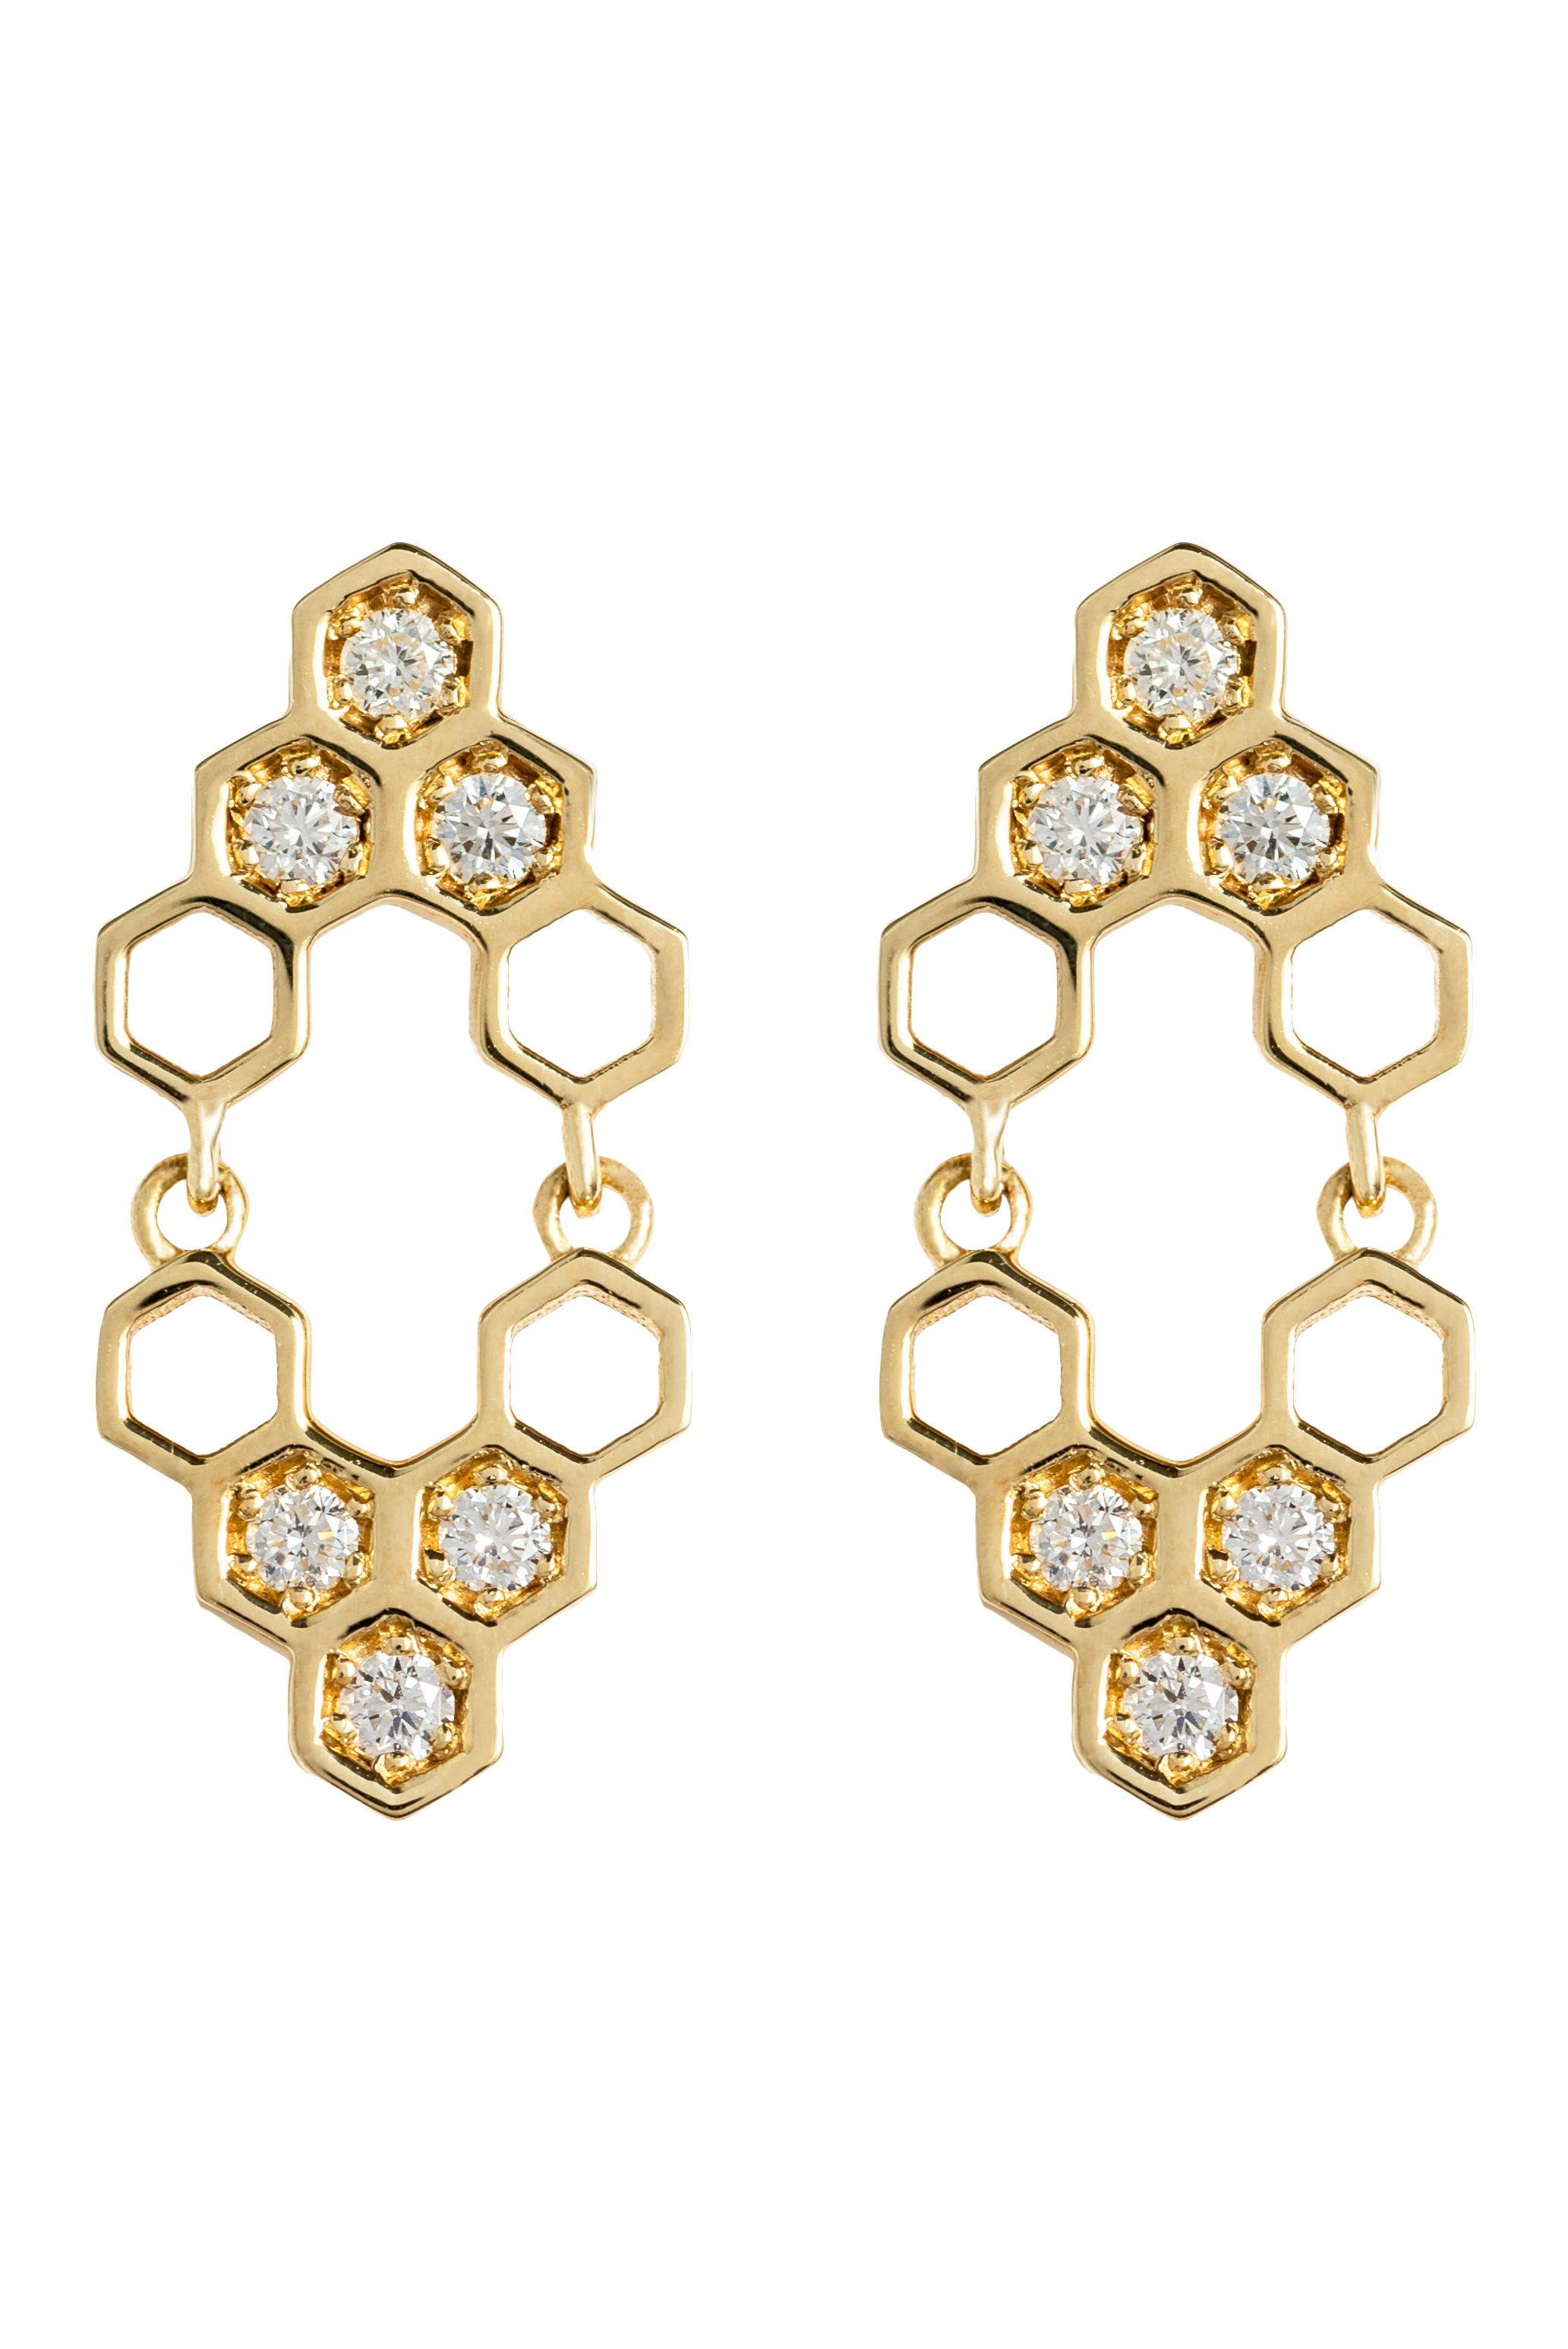 Honeycombs Mirall Earrings